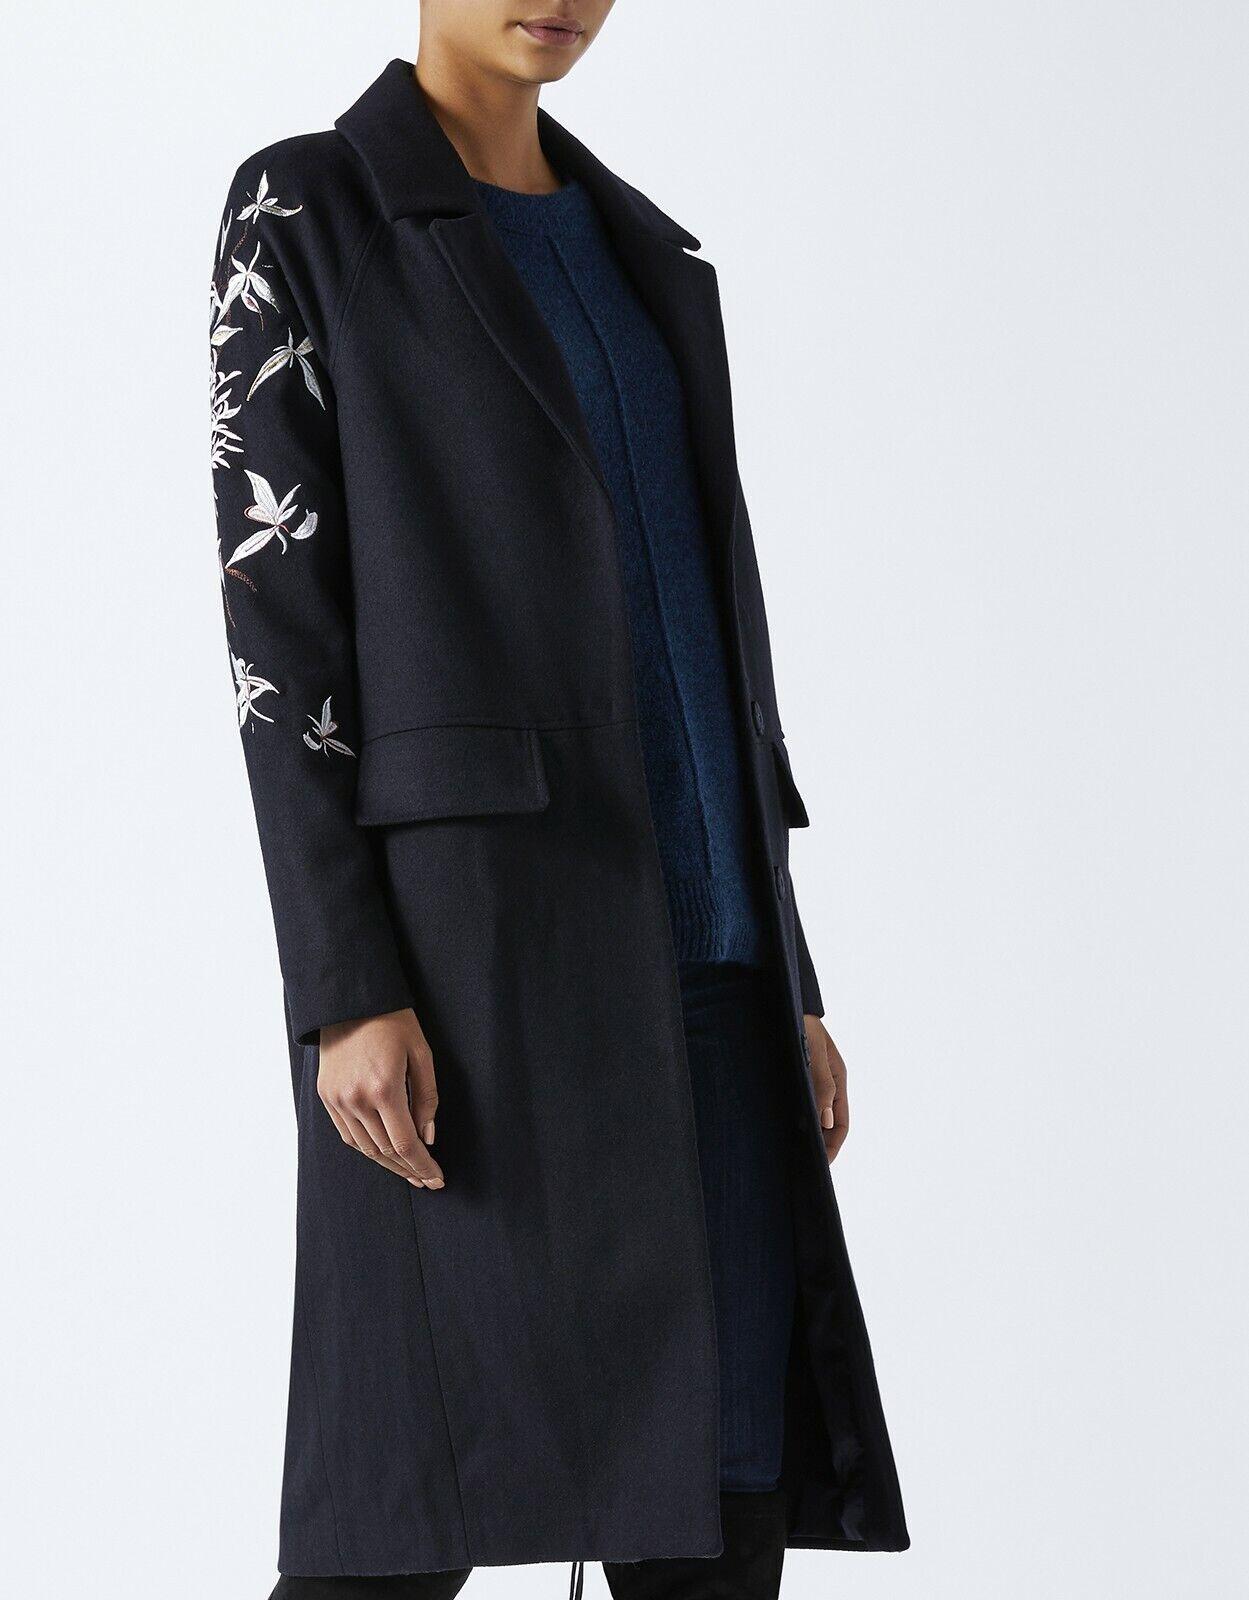 Monsoon Embroidered Long Coat - Navy - UK Size 8